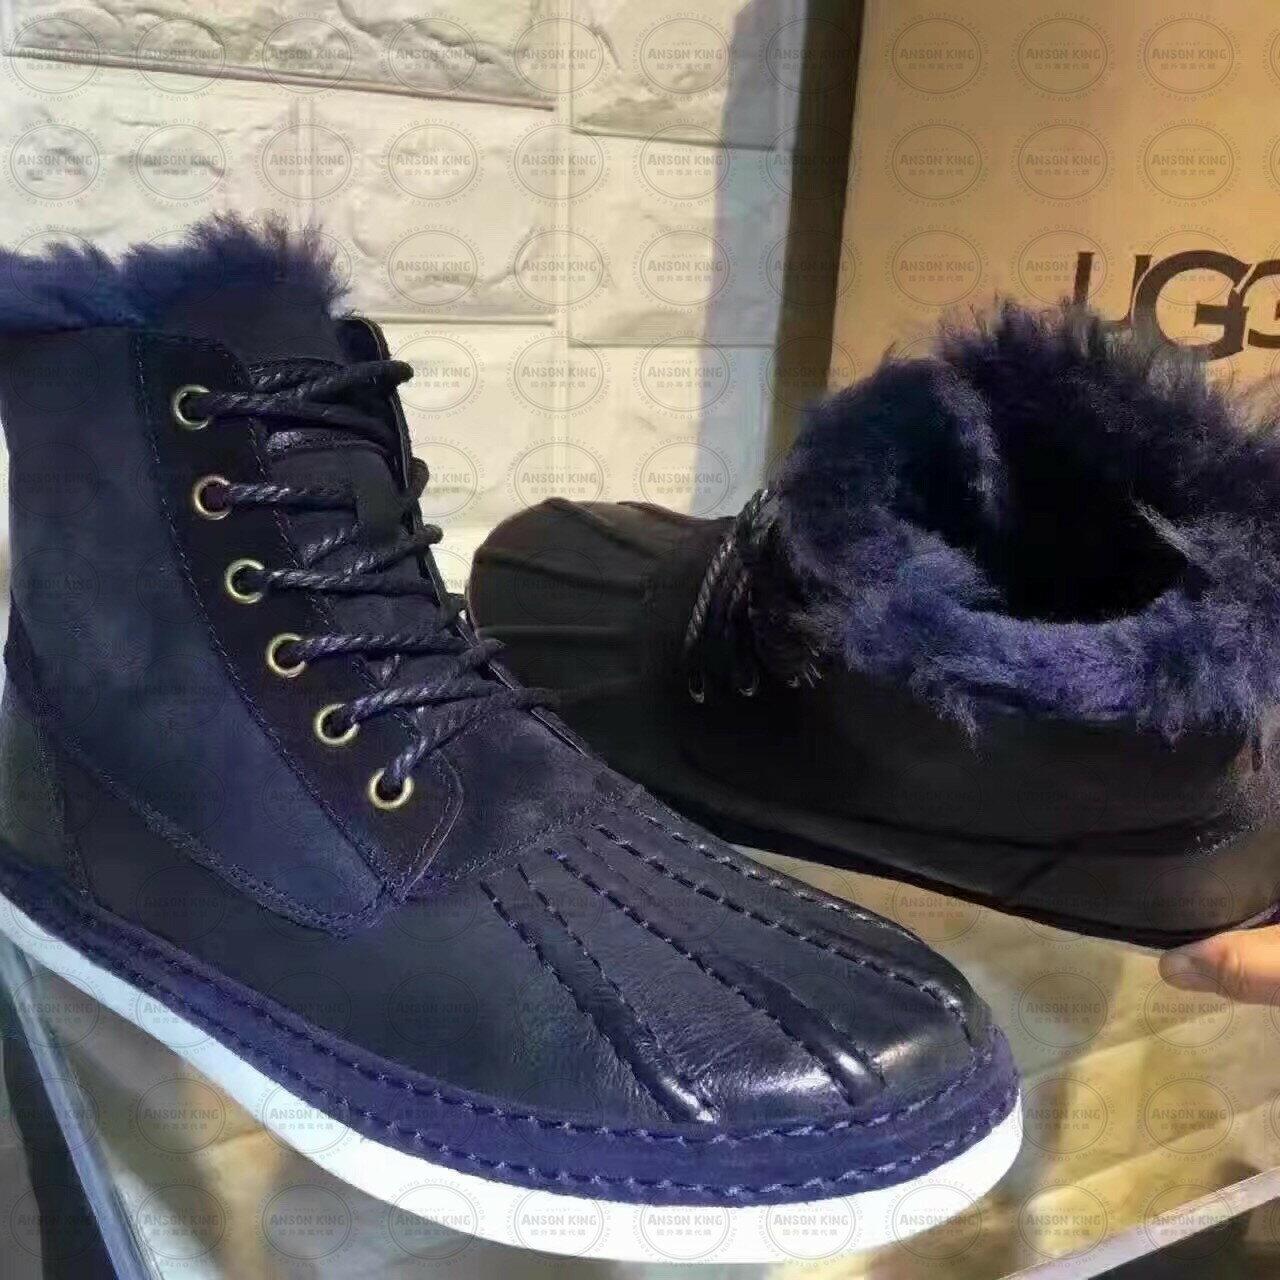 OUTLET正品代購 澳洲 UGG 冬季男款貝殼頭馬丁靴 短靴 保暖 真皮羊皮毛 雪靴 短靴 深藍 2